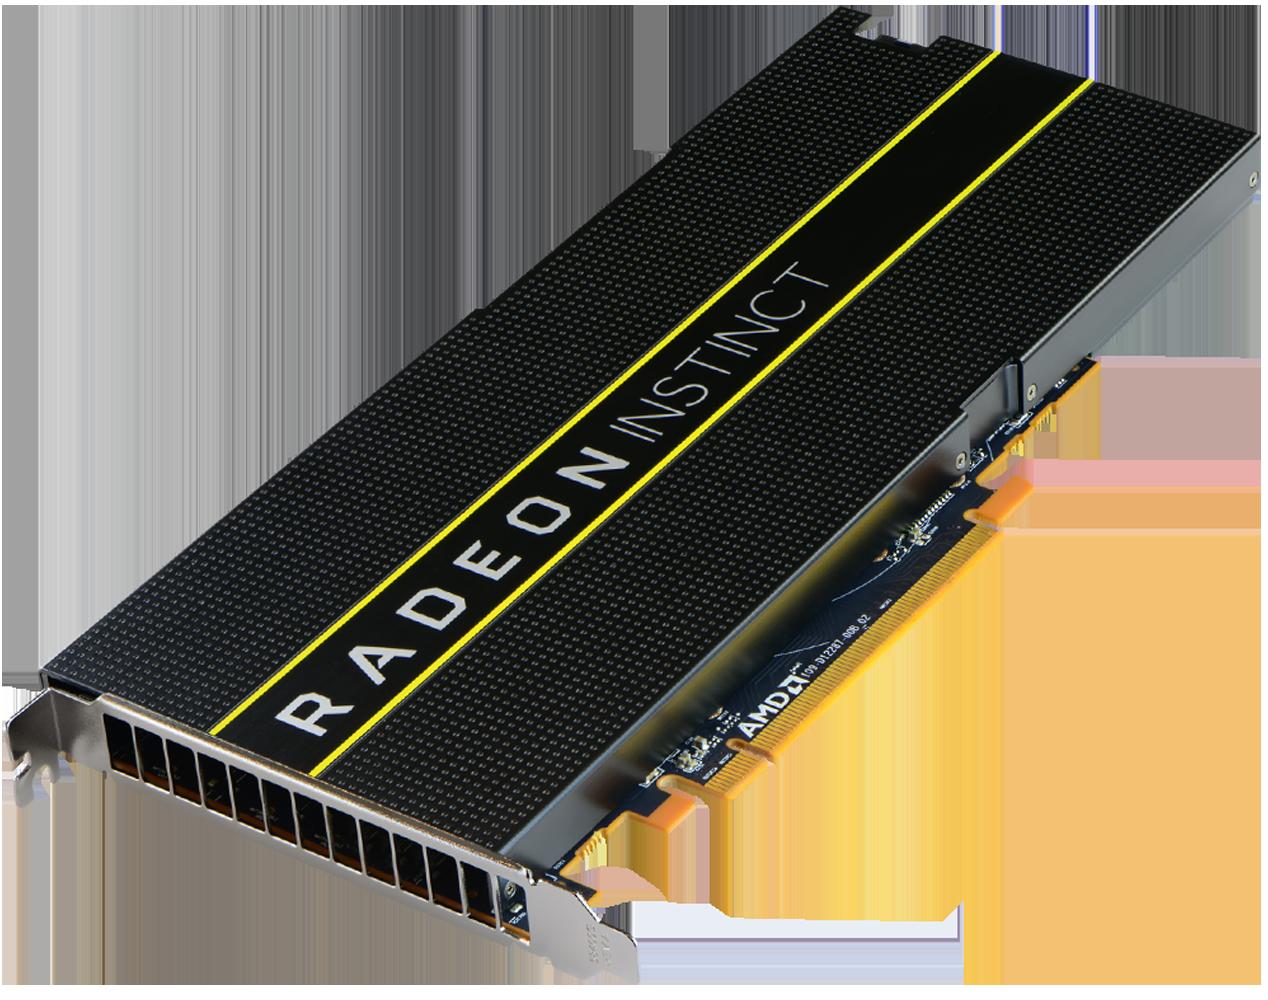 AMD Launches Vega GPU Based Radeon Instinct MI25 AI Accelerator